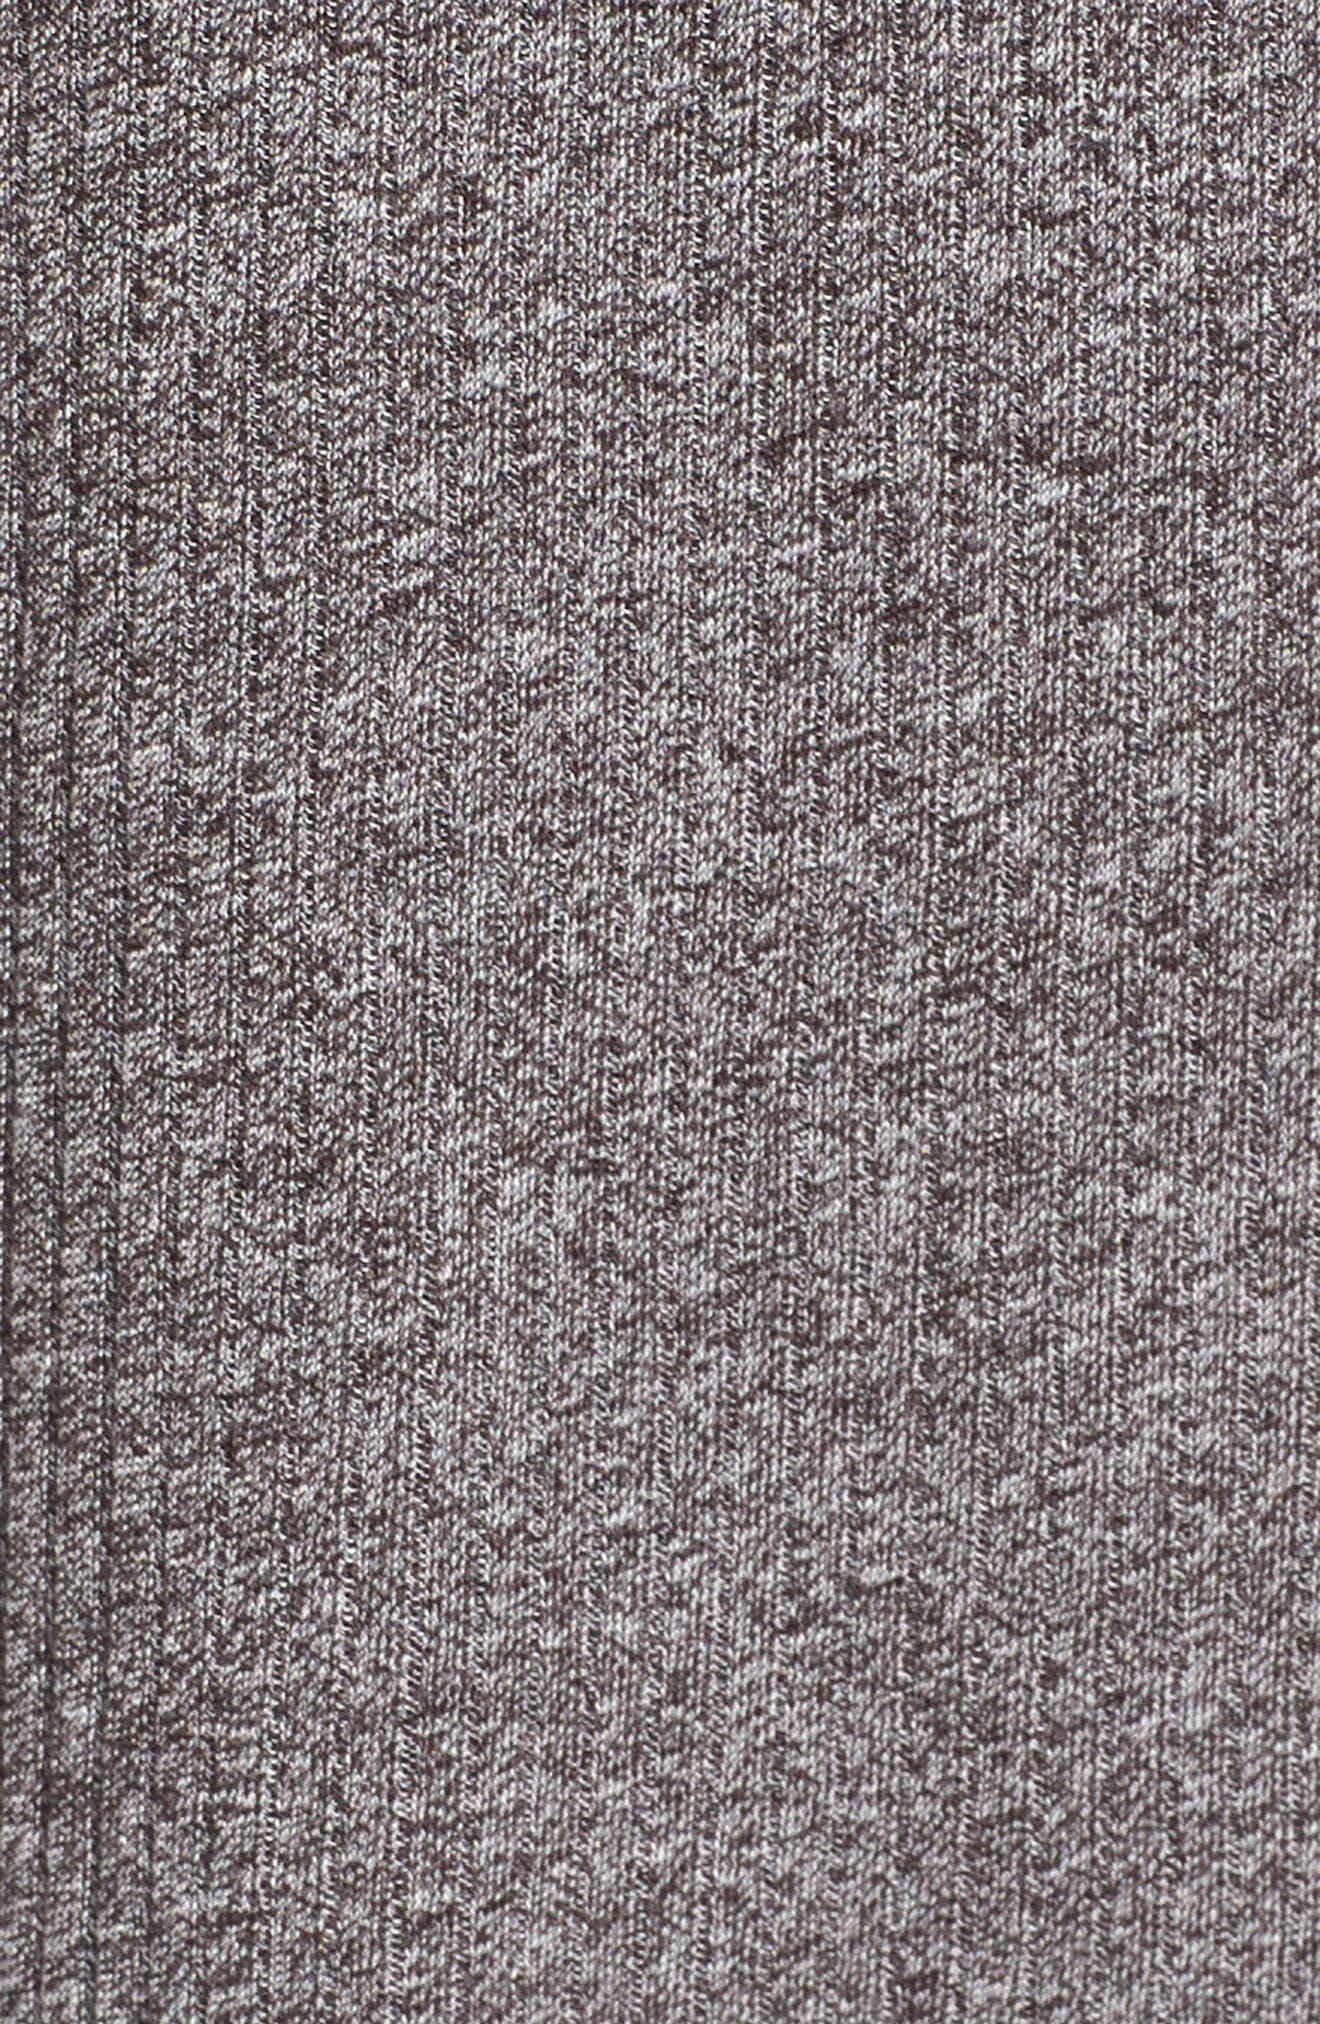 Barbados Rib Knit Dress,                             Alternate thumbnail 5, color,                             020